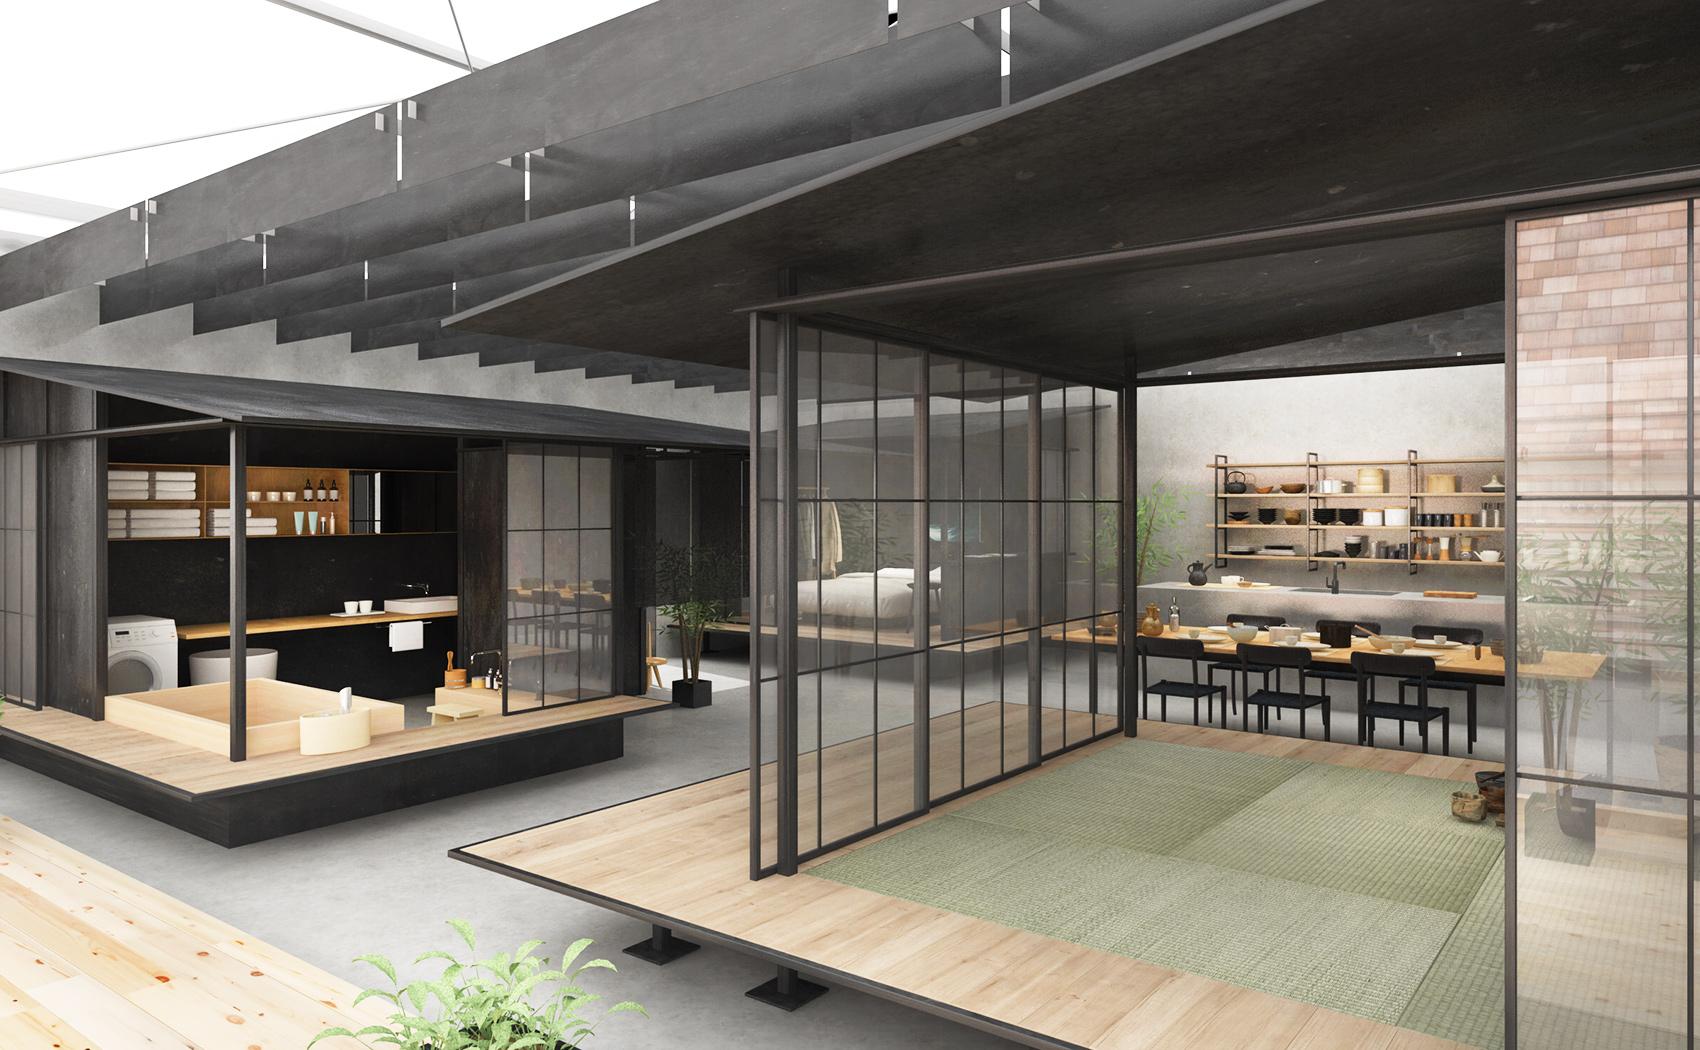 2016 tokyo exhibition house vision for Home designs com